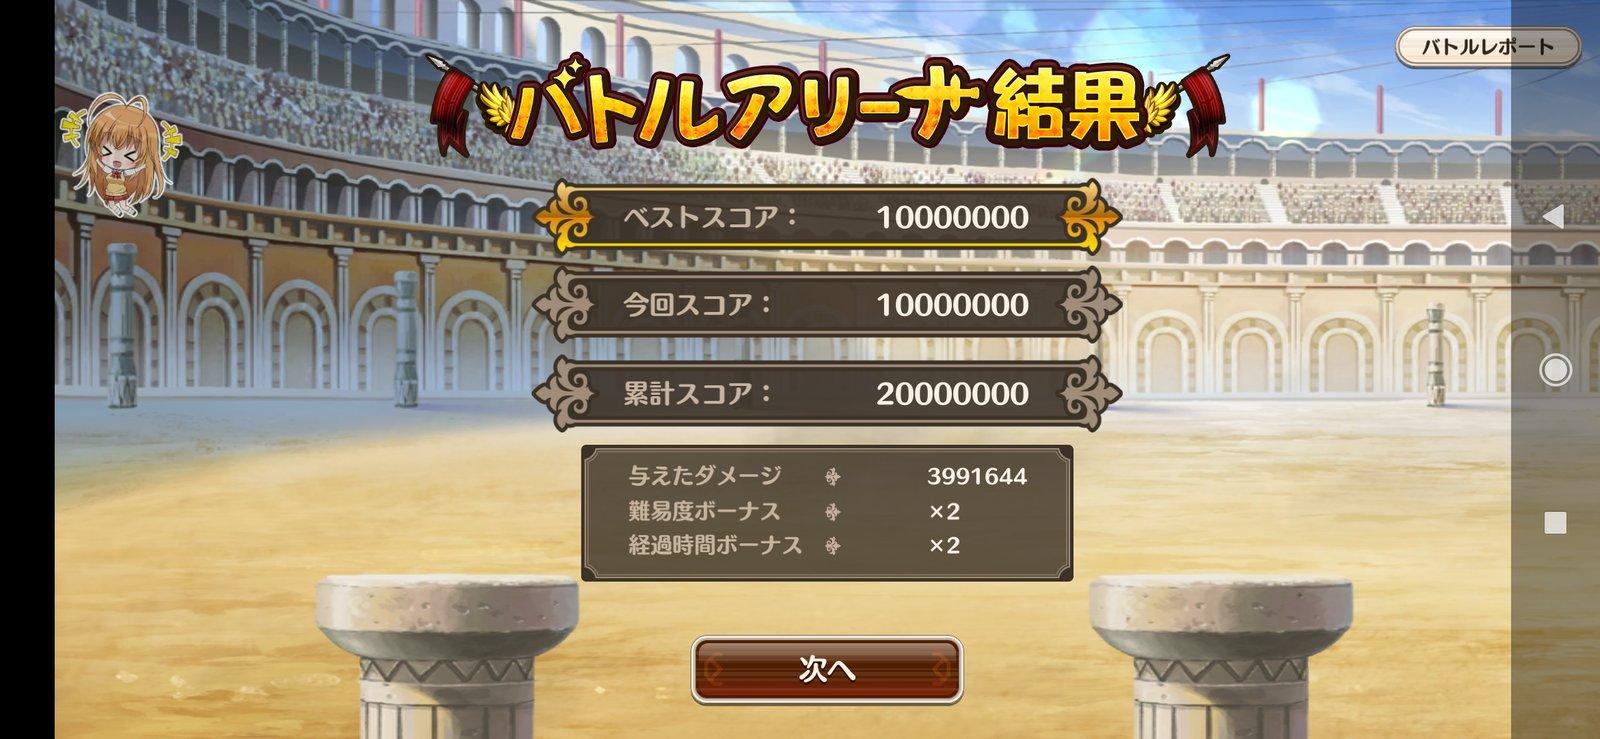 Screenshot_2020-09-14-16-26-28-796_jp.co.sumzap.pj0007.jpg